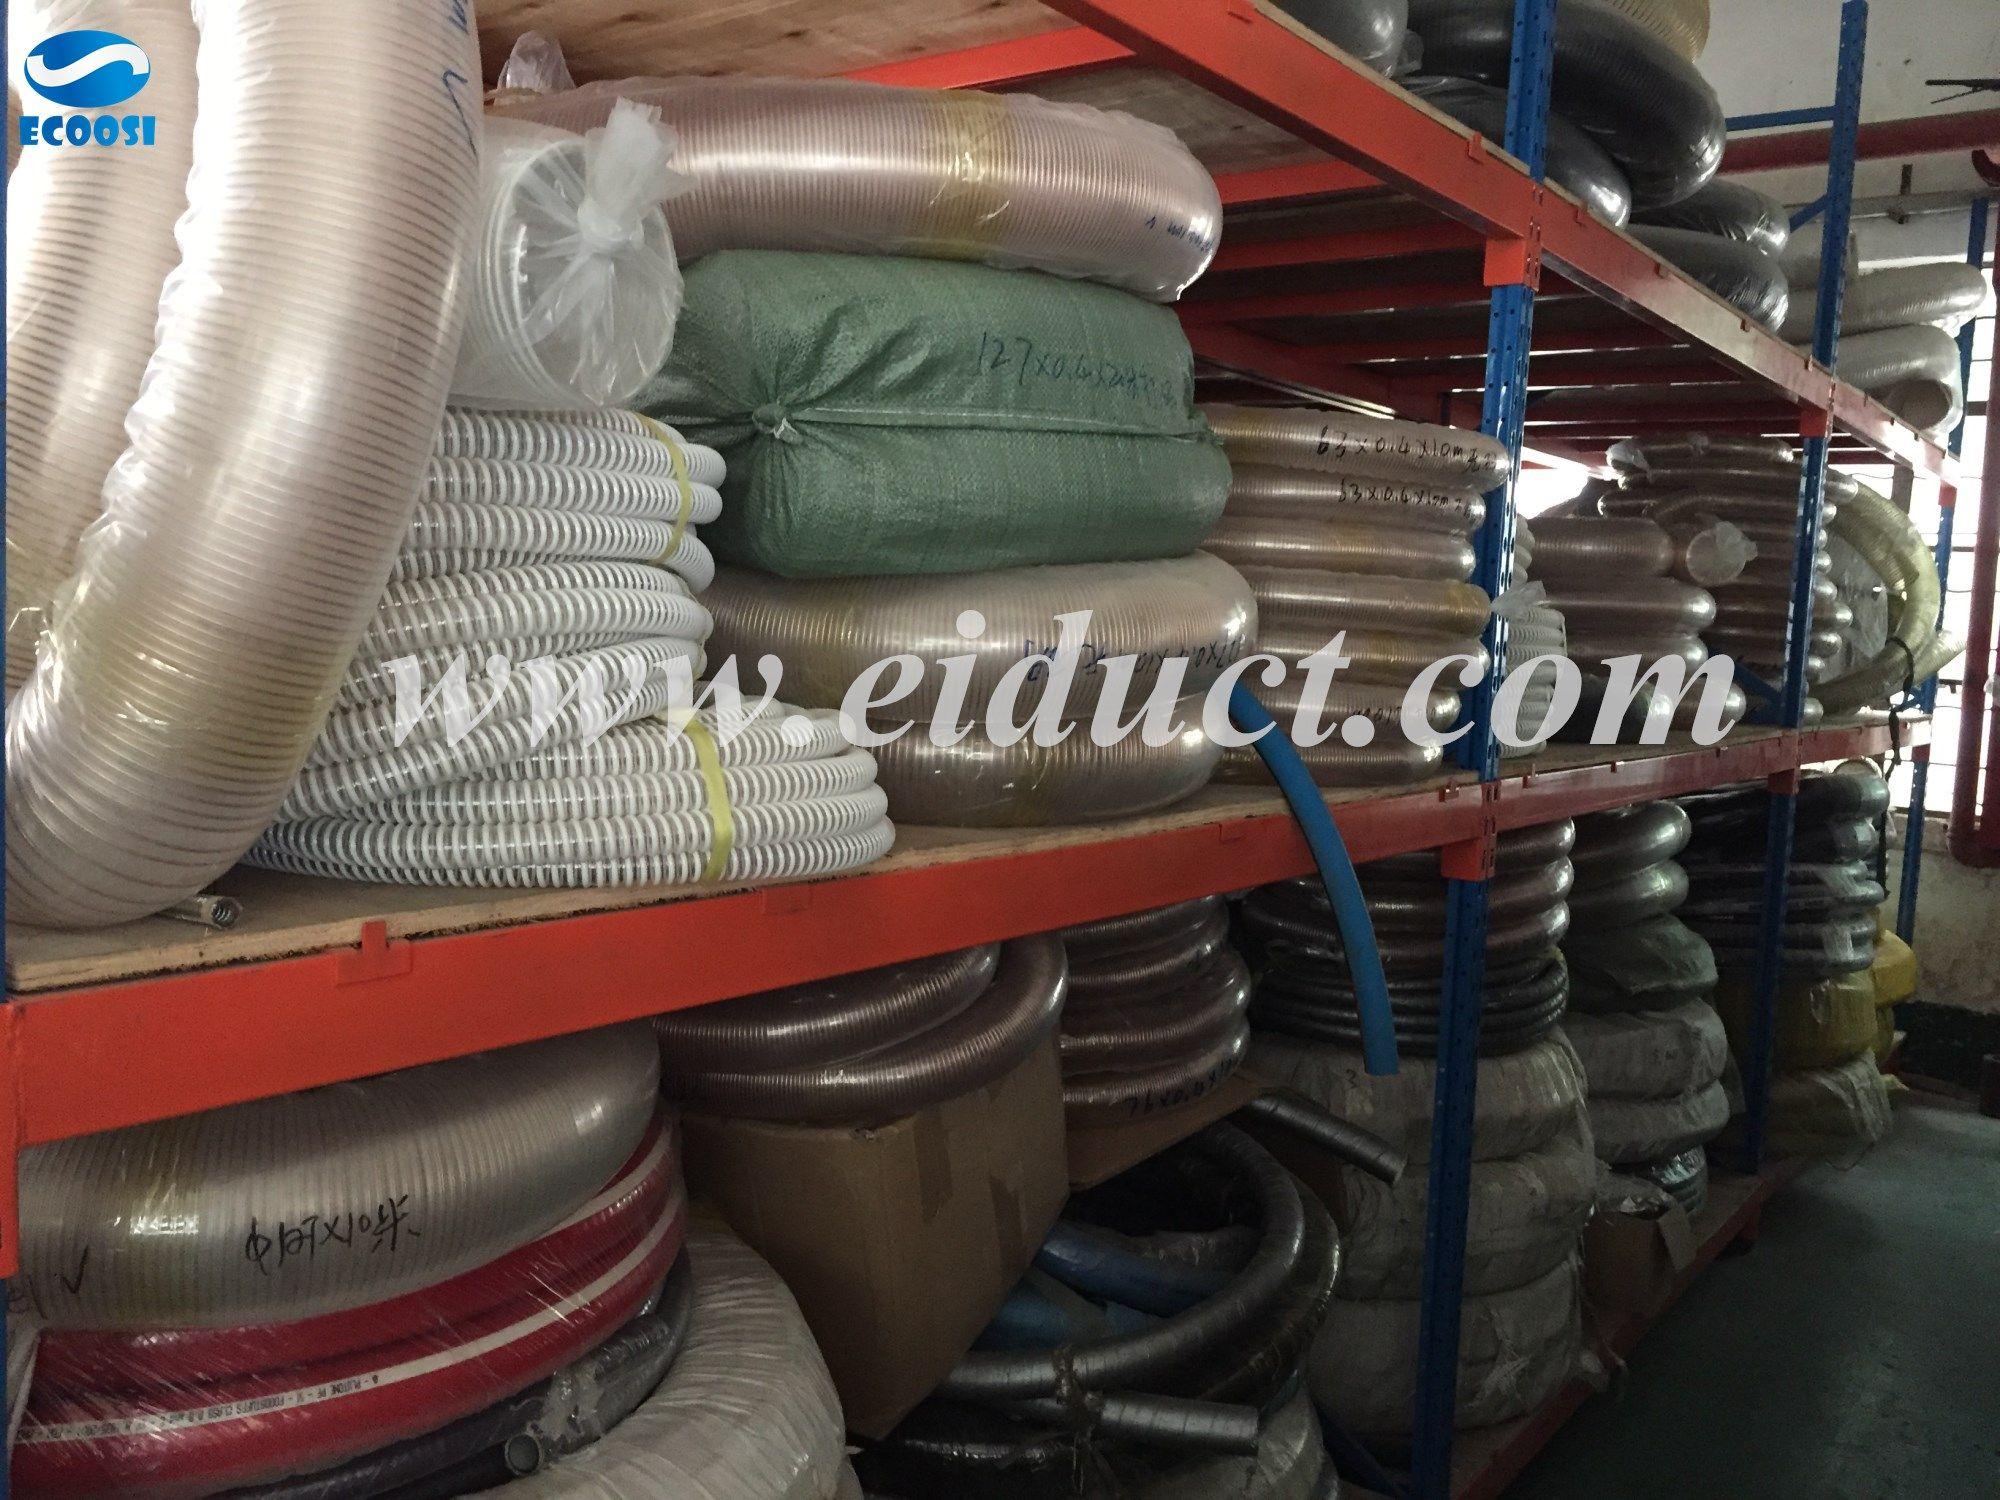 Flex duct industrial hose manufacturer Dust collection